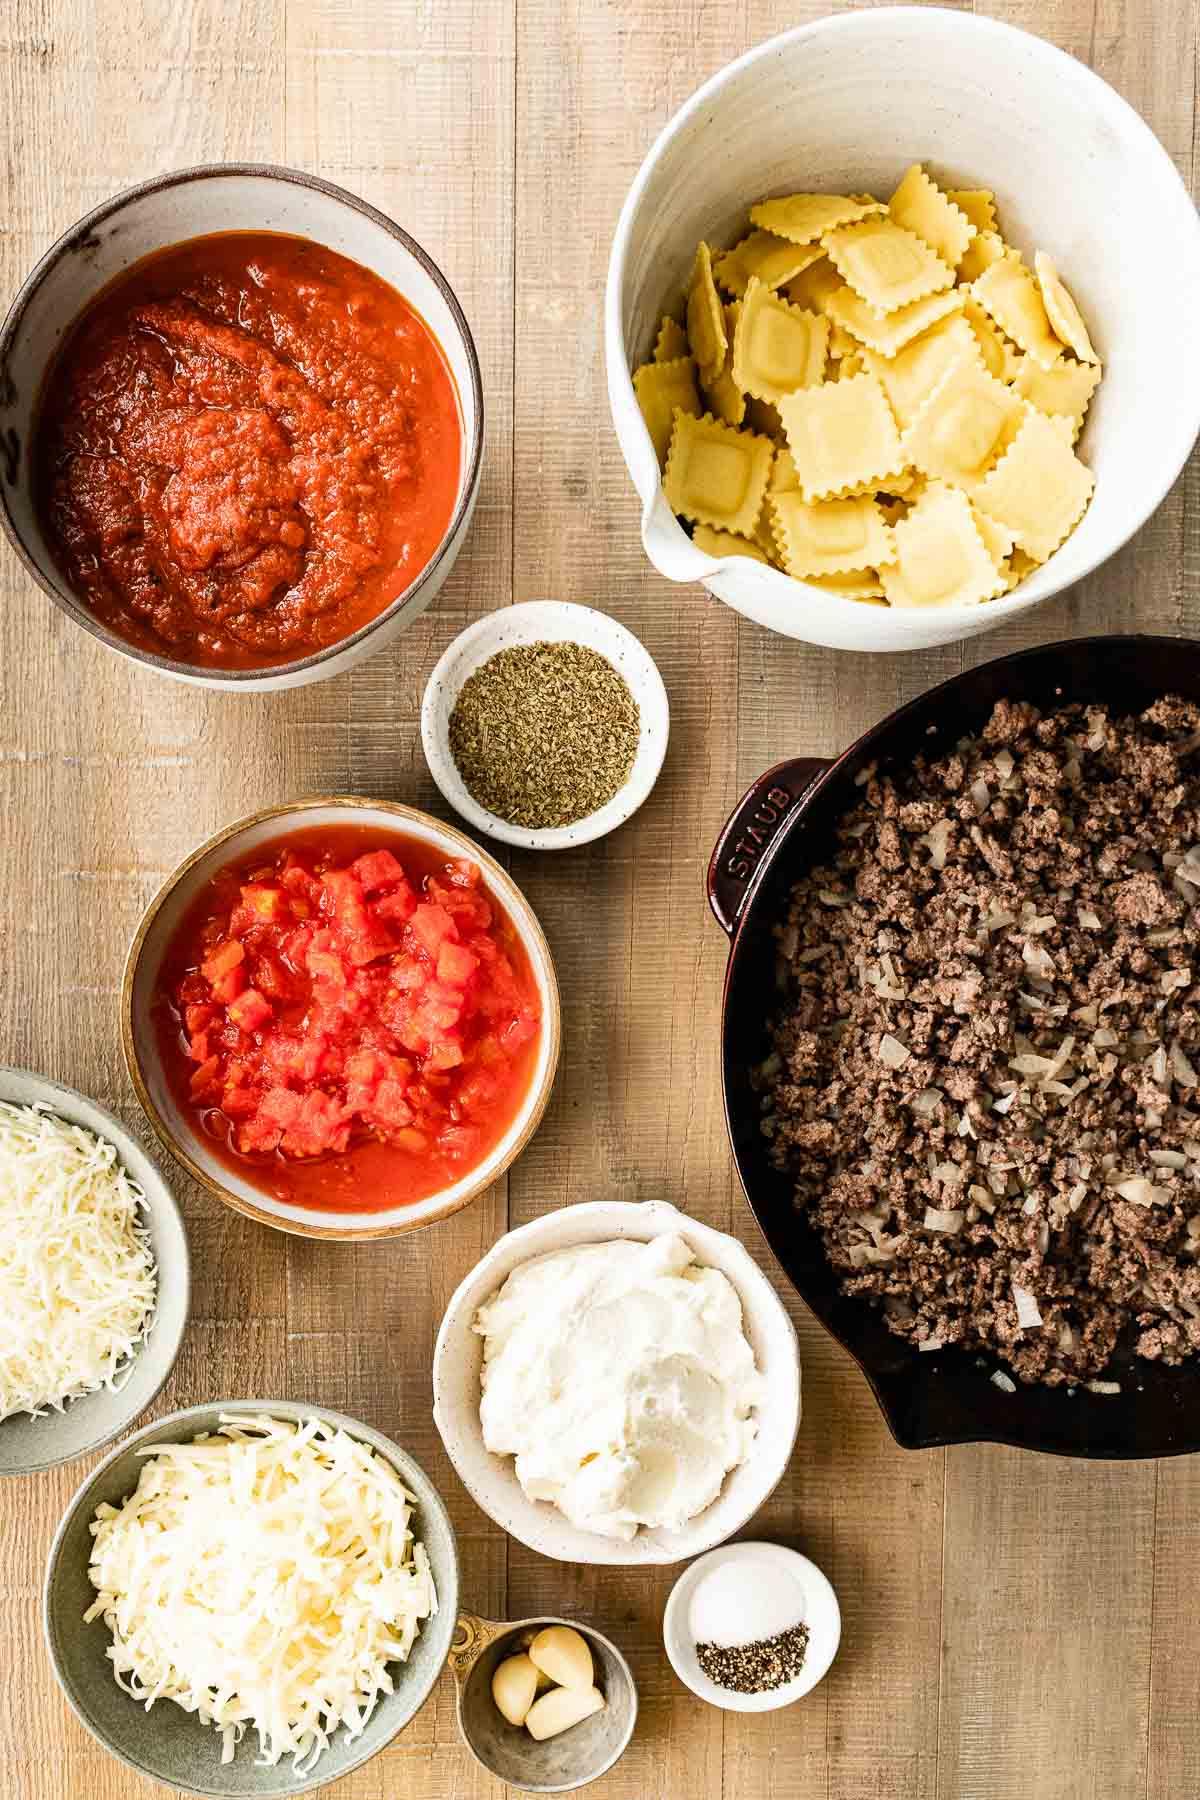 Ingredients in prep bowls for Ravioli Lasagna Bake